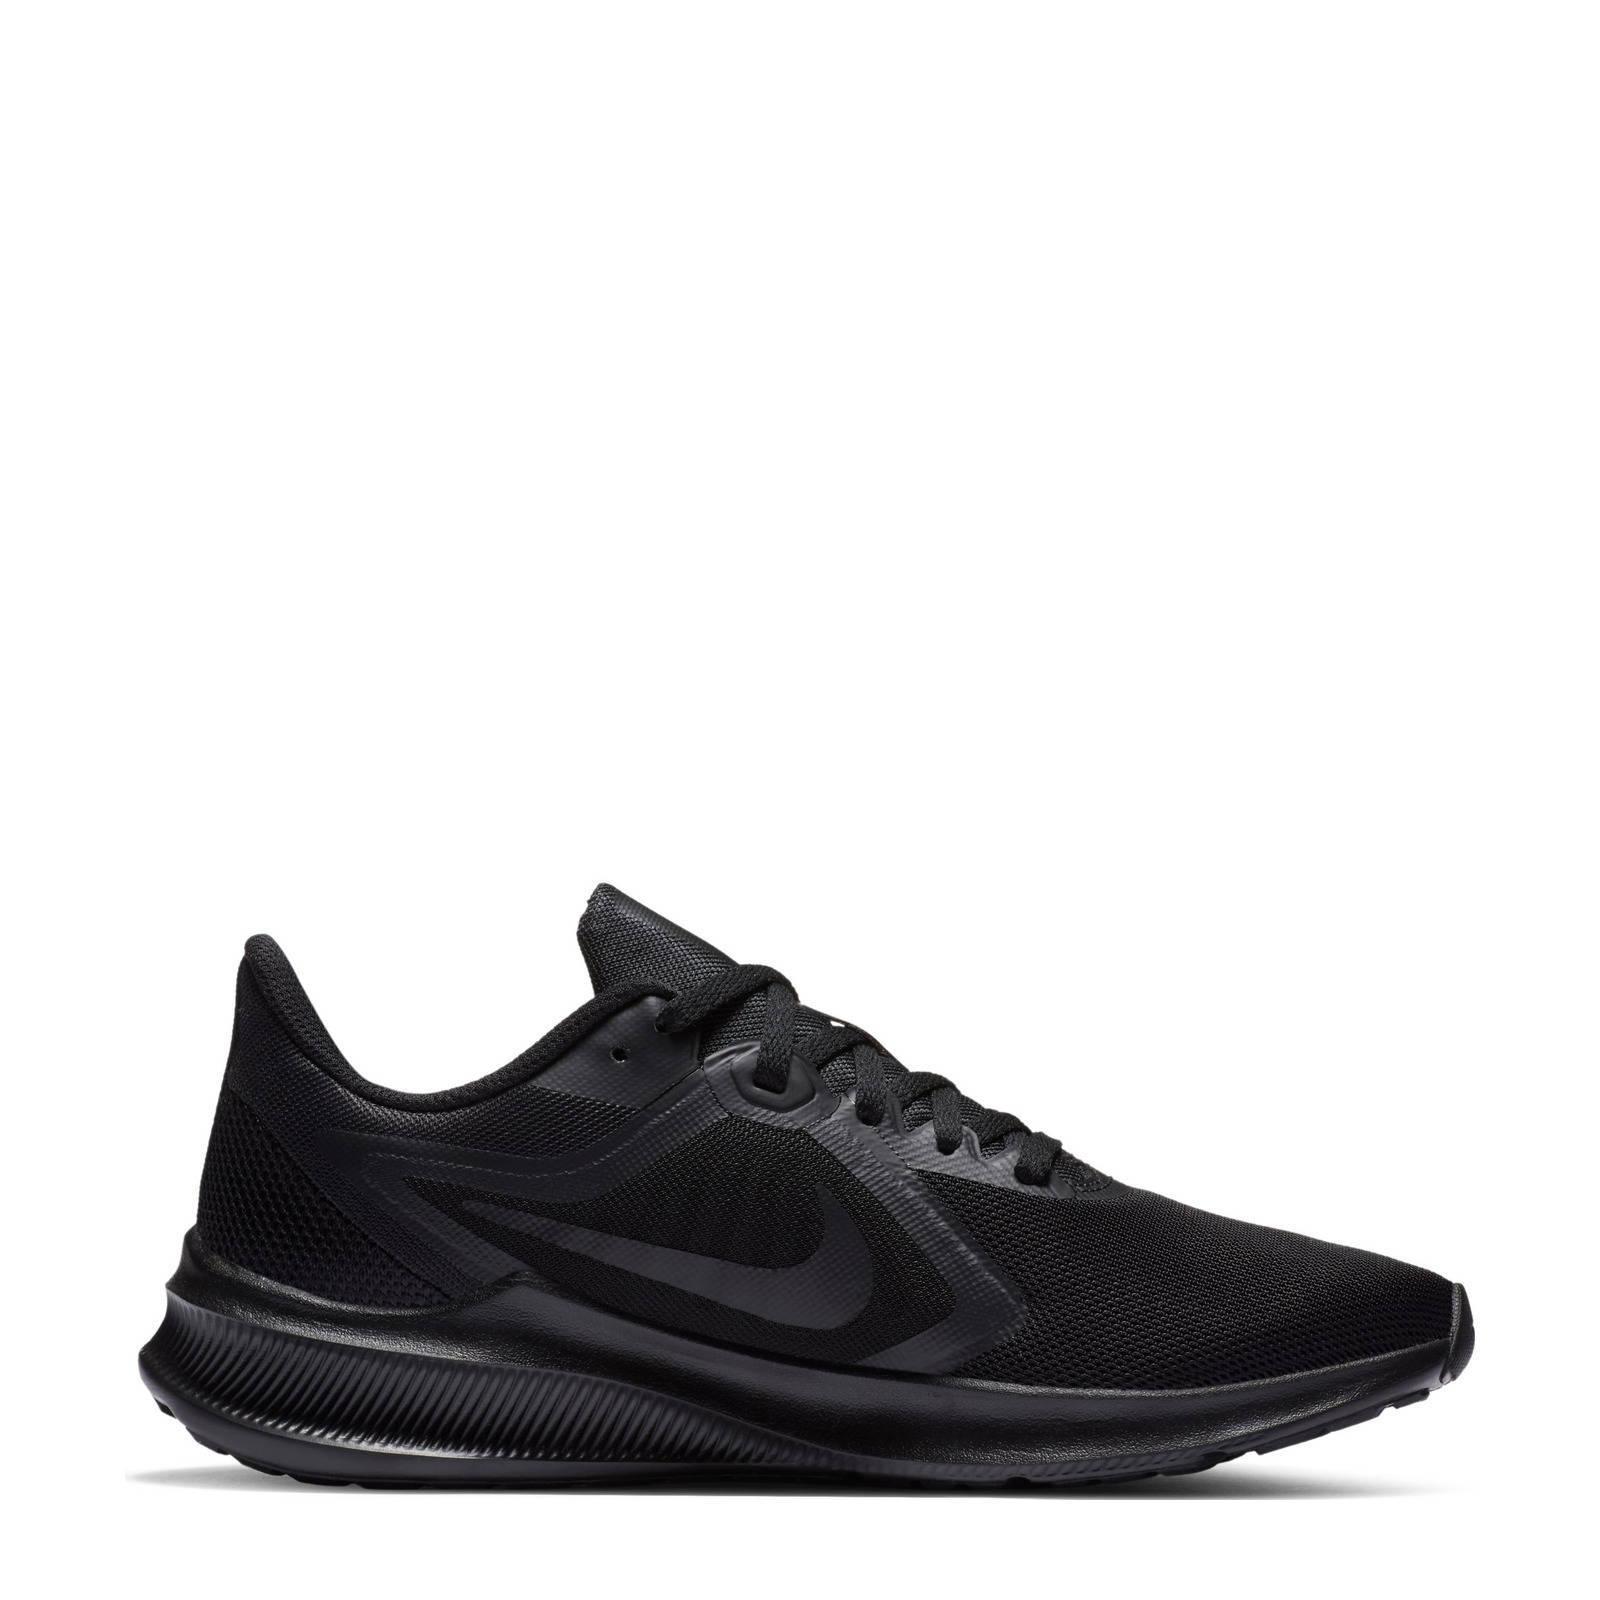 Nike Downshifter 10 hardloopschoenen zwart online kopen